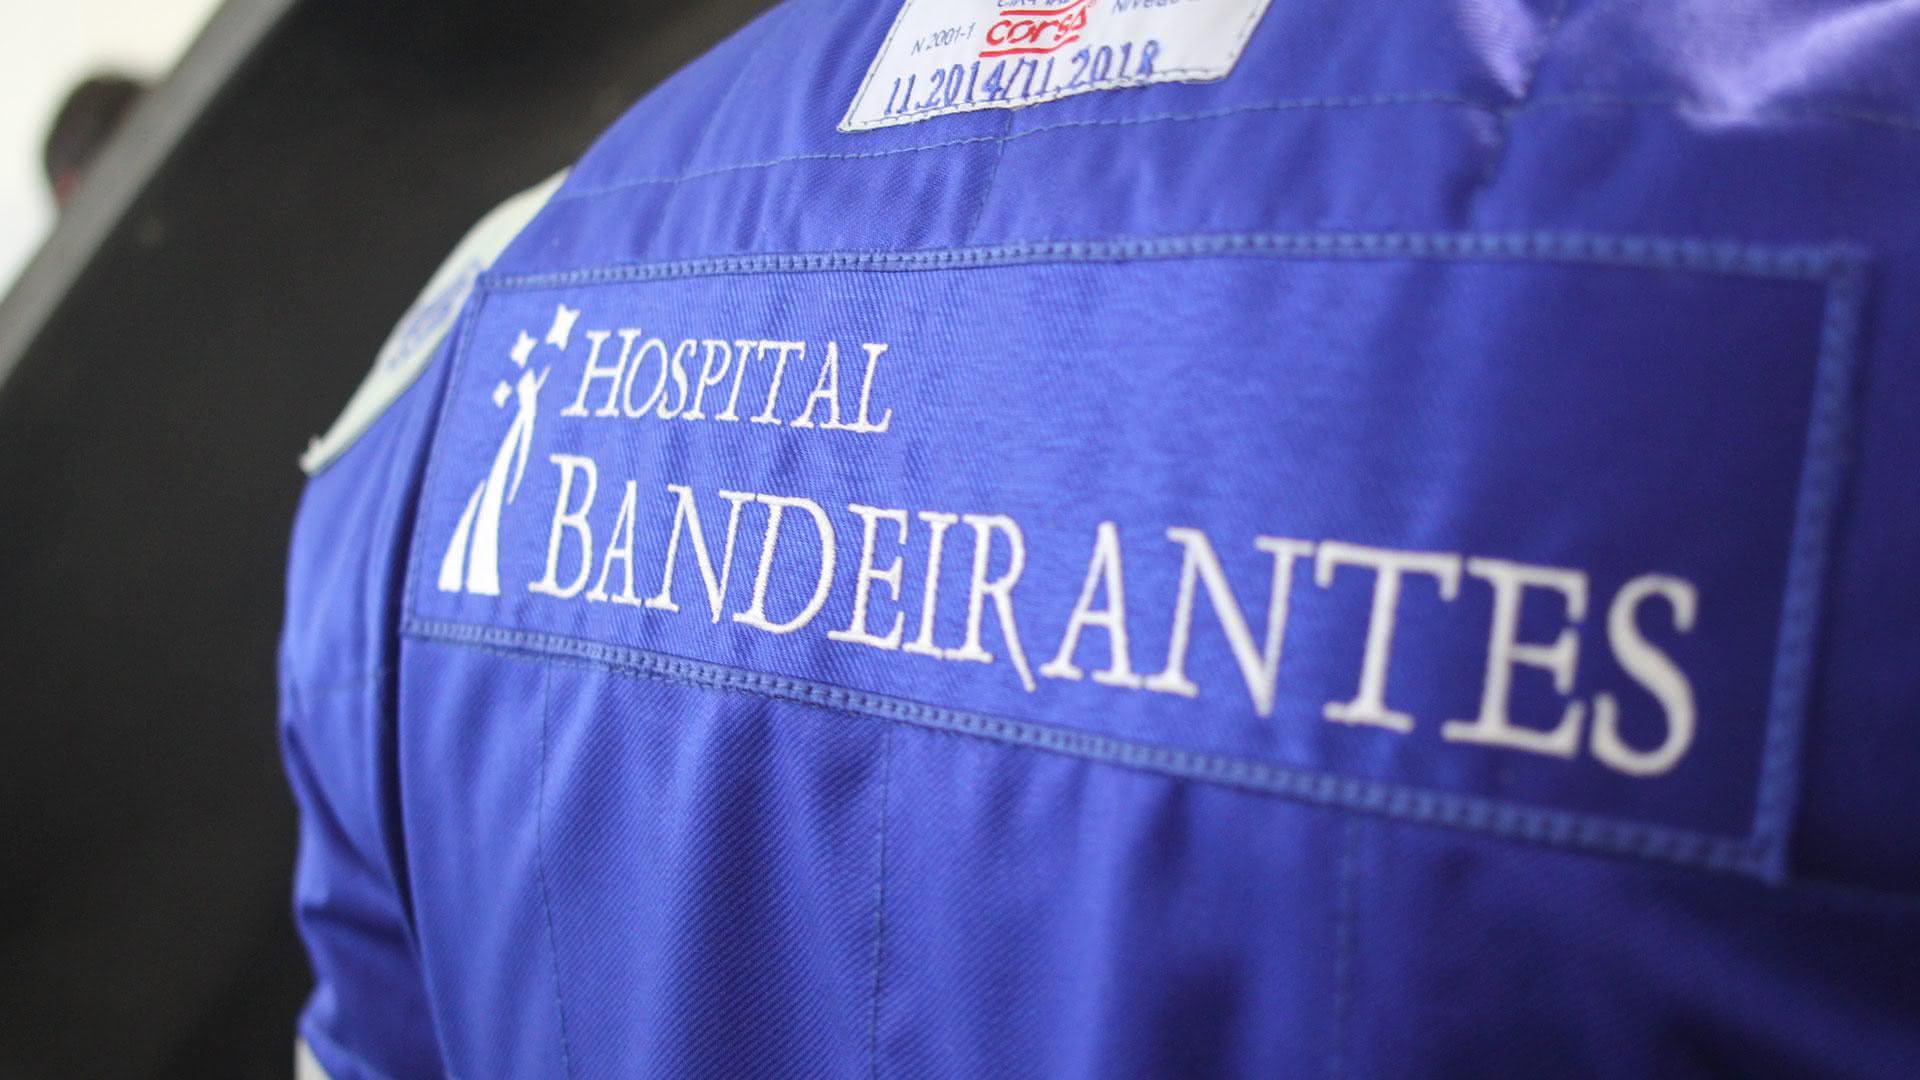 Jovem Aprendiz Hospital Bandeirantes 2017